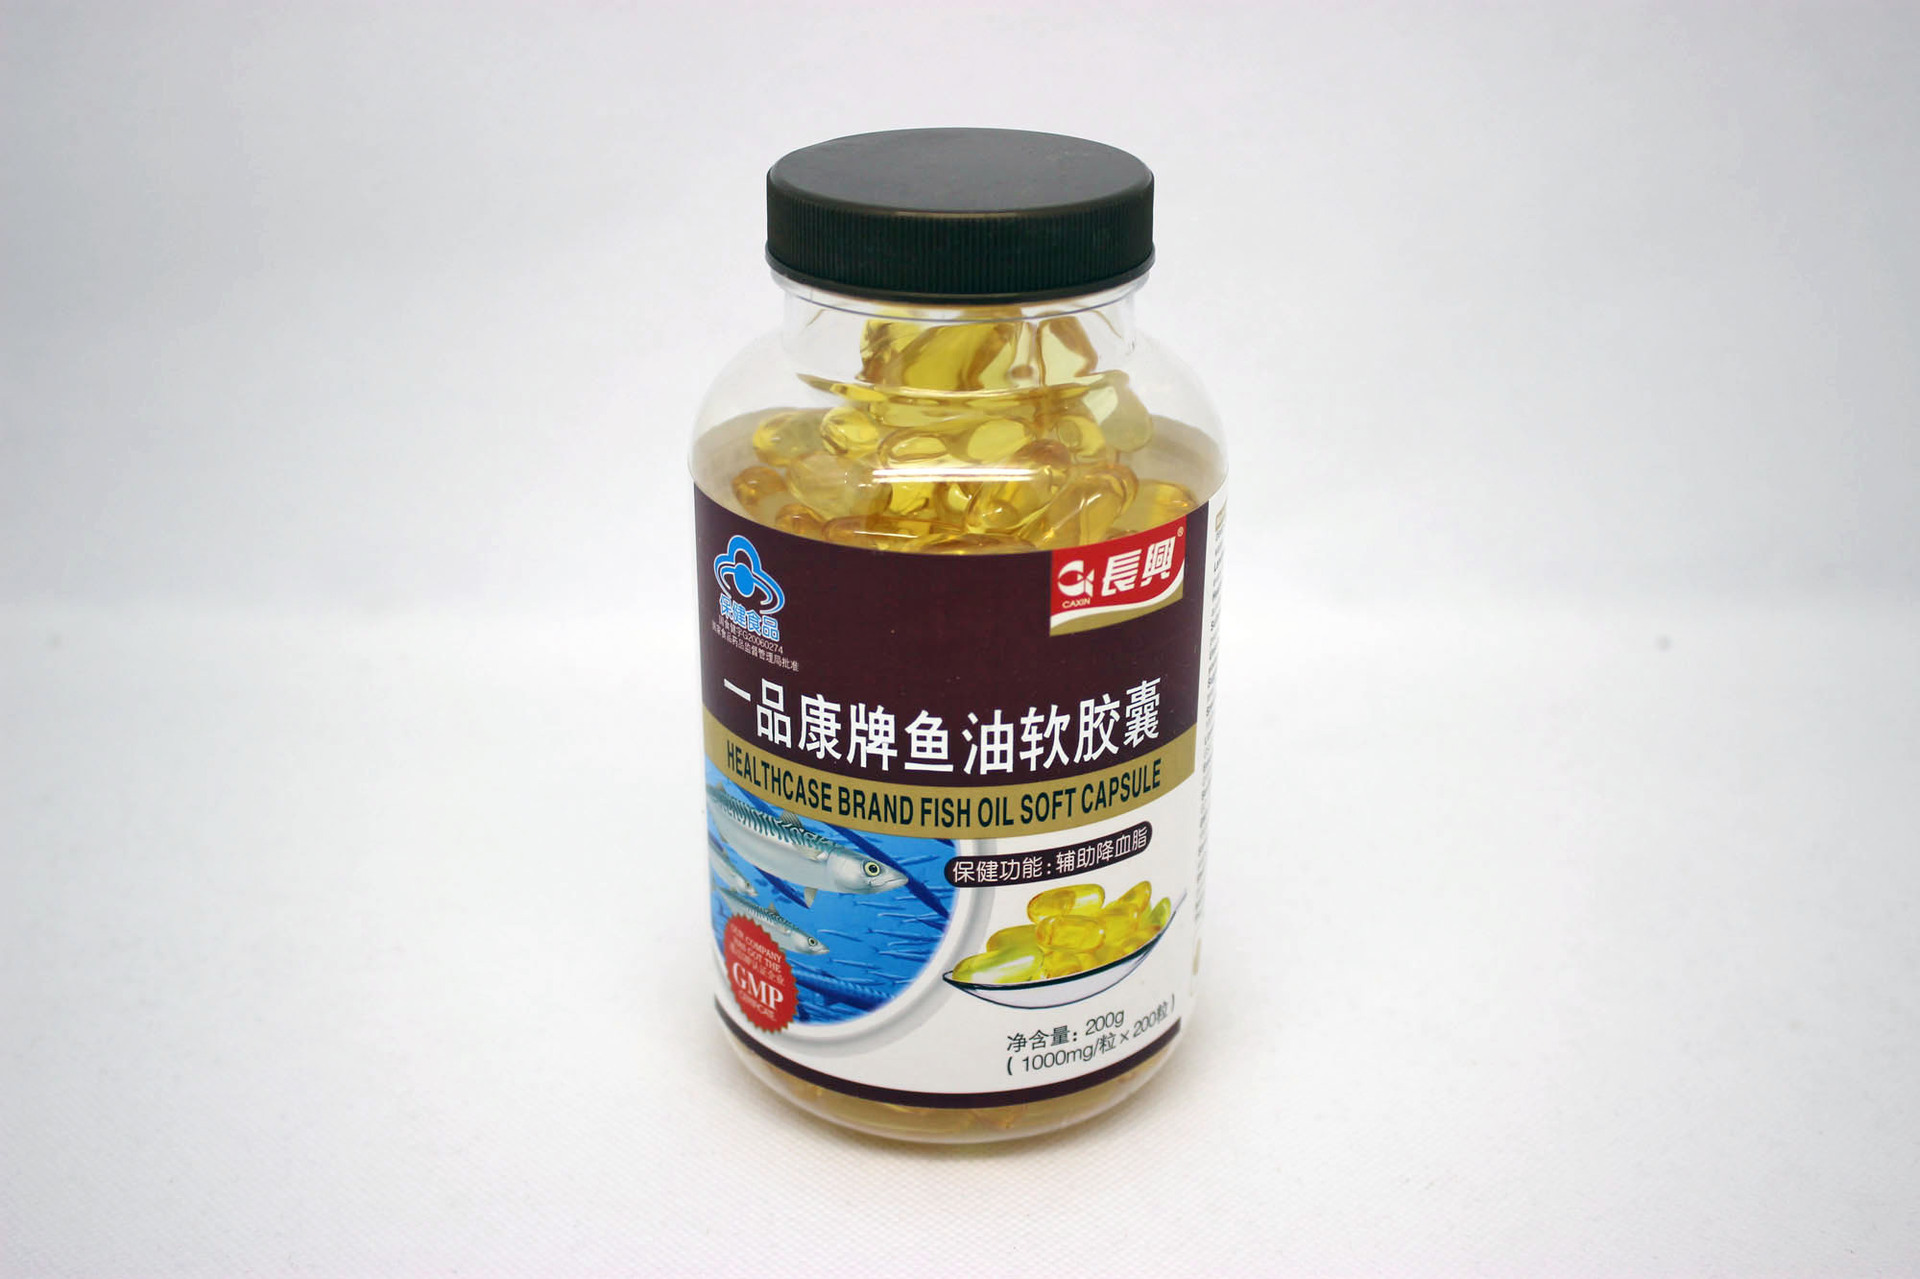 Fish oil capsules soft gelatin glycerin health food fat gelatin glycerin(China (Mainland))